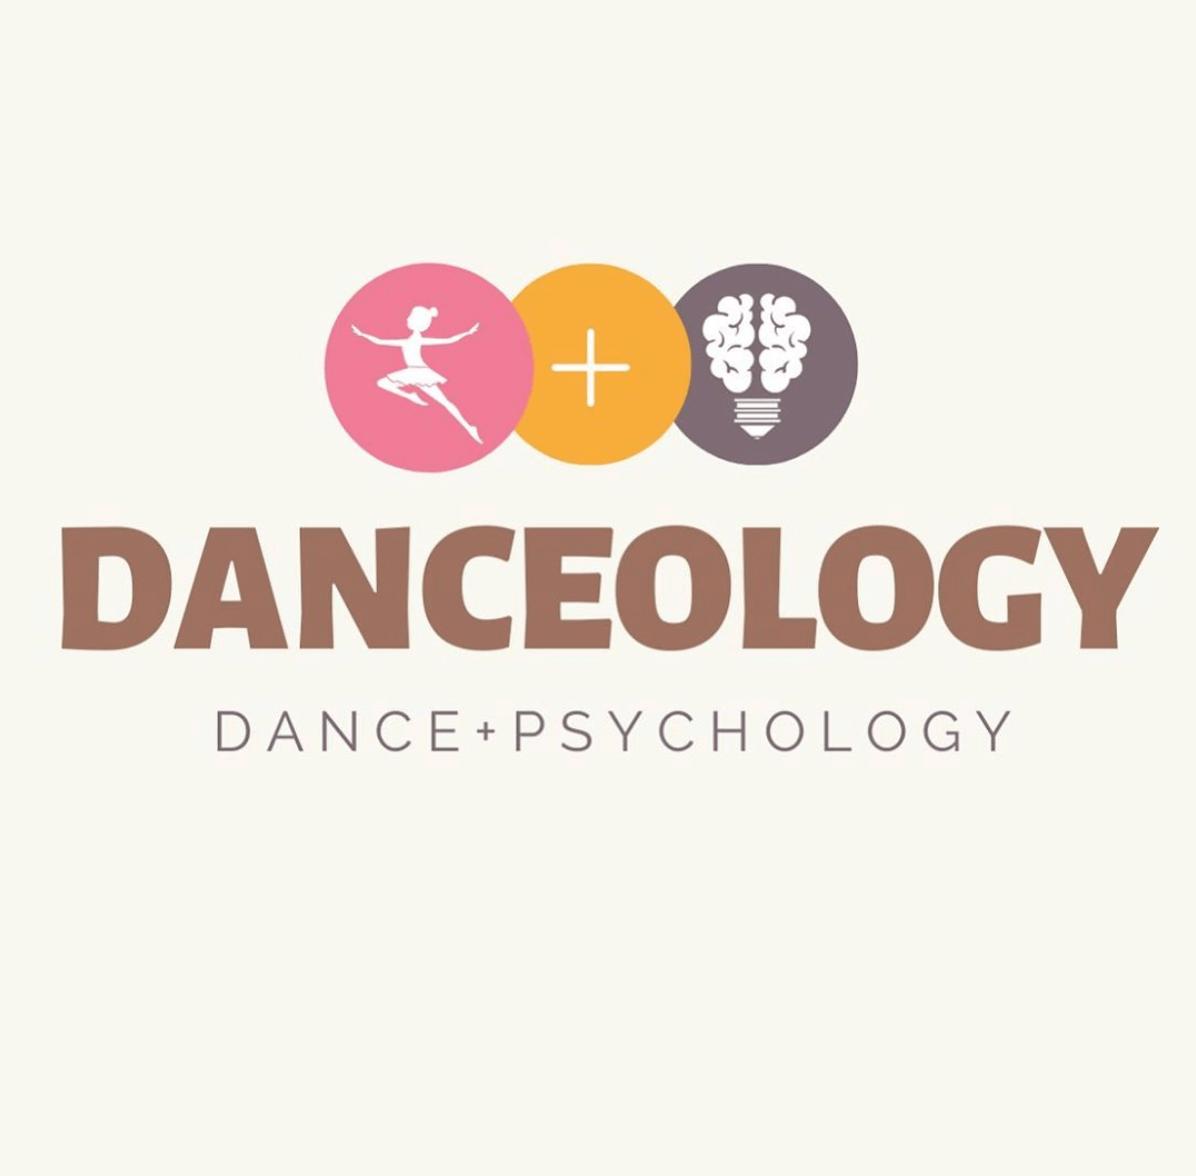 логотип бренда danceology